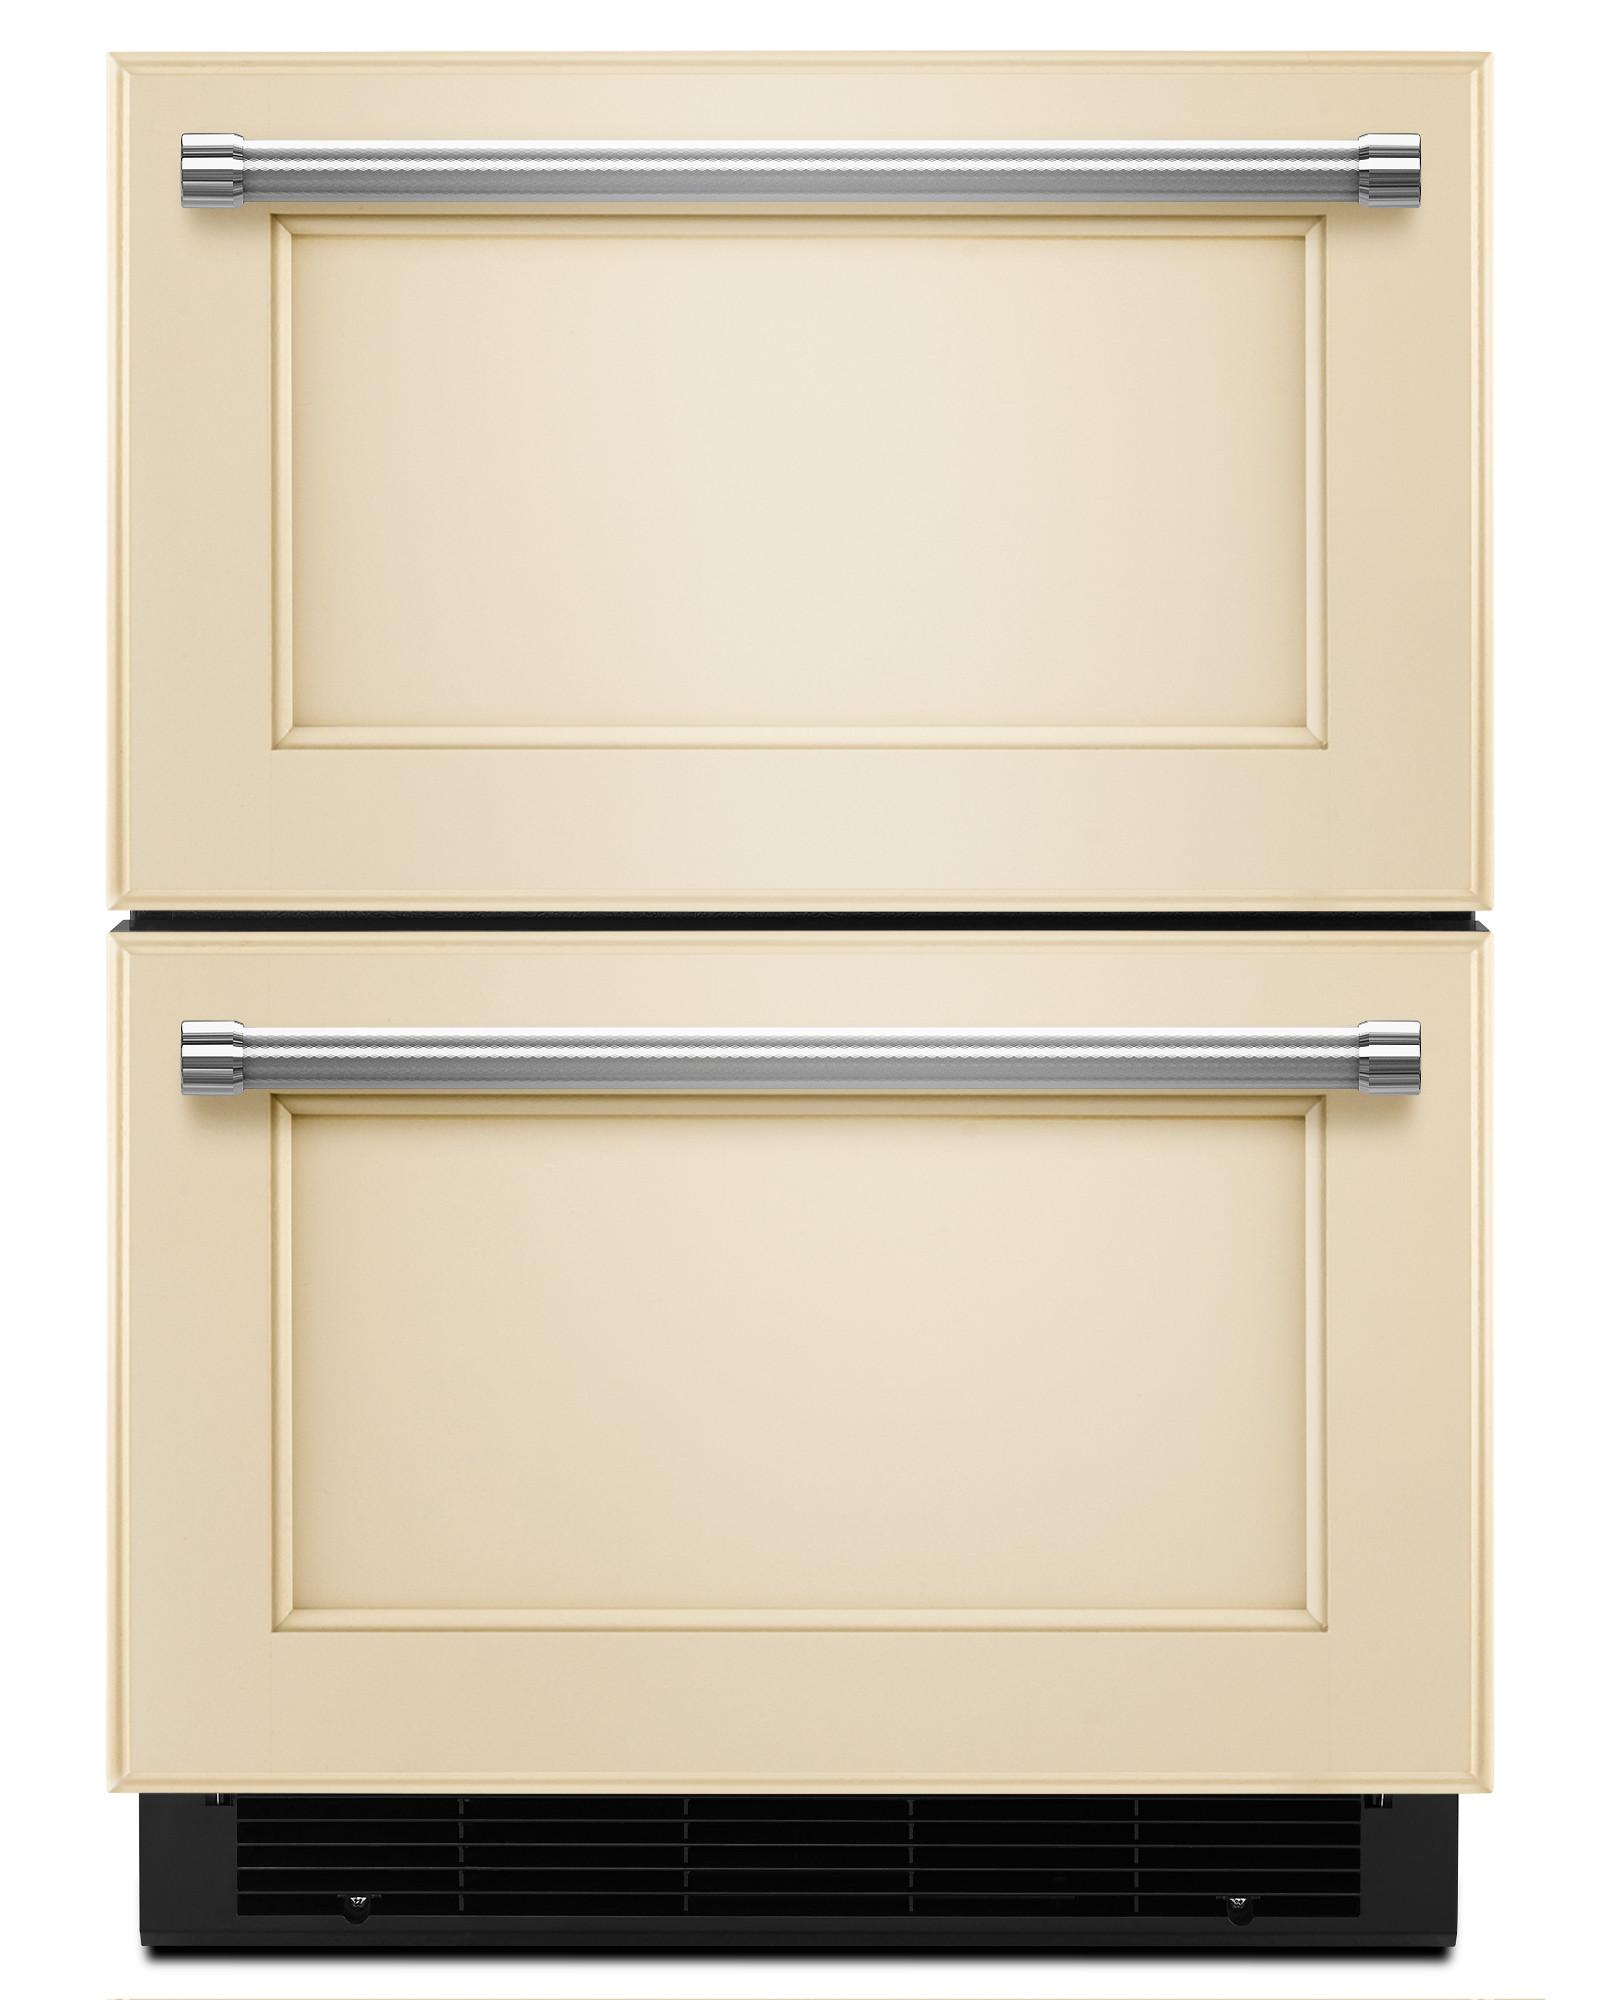 KitchenAid KUDF204EPA 4.7 cu. ft. Refrigerator/Freezer Drawer - Panel Ready